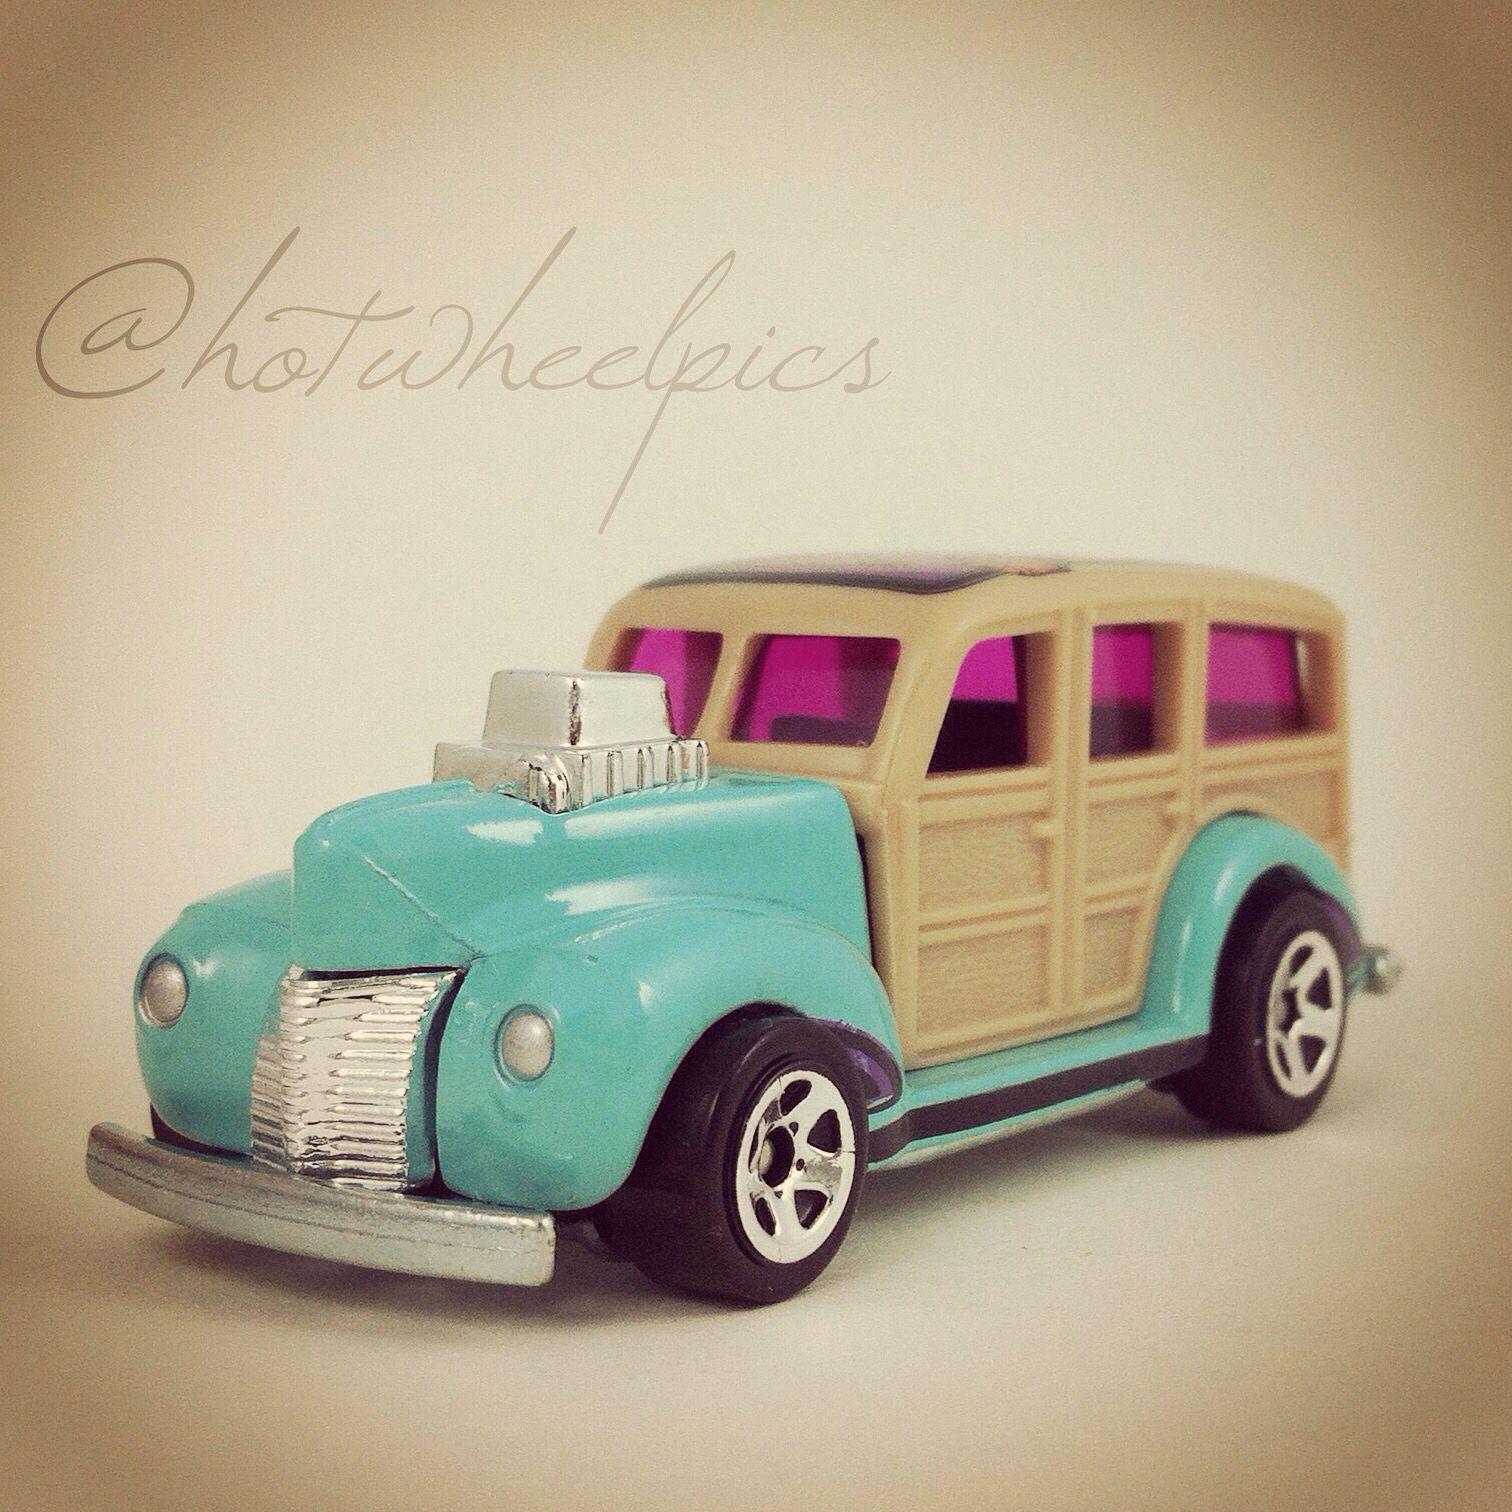 Mattel hot wheels hw road trippin series 20 21 road 14 torquoise trail 40 s woodie wagon miniature die cast metal scale model vehic